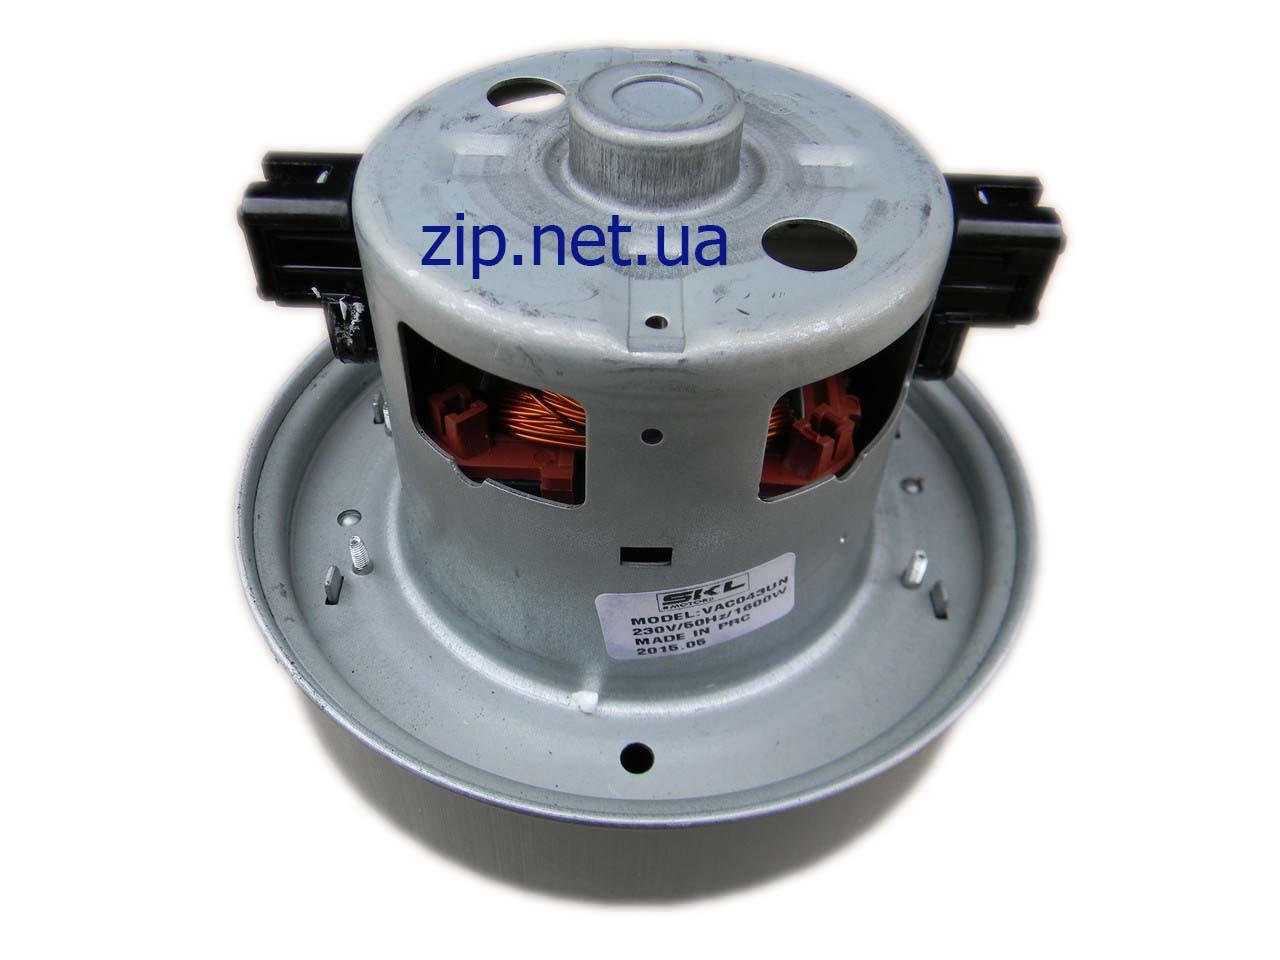 Мотор к пылесосу 1600 W d-135 mm. H-118 mm. Samsung K-70